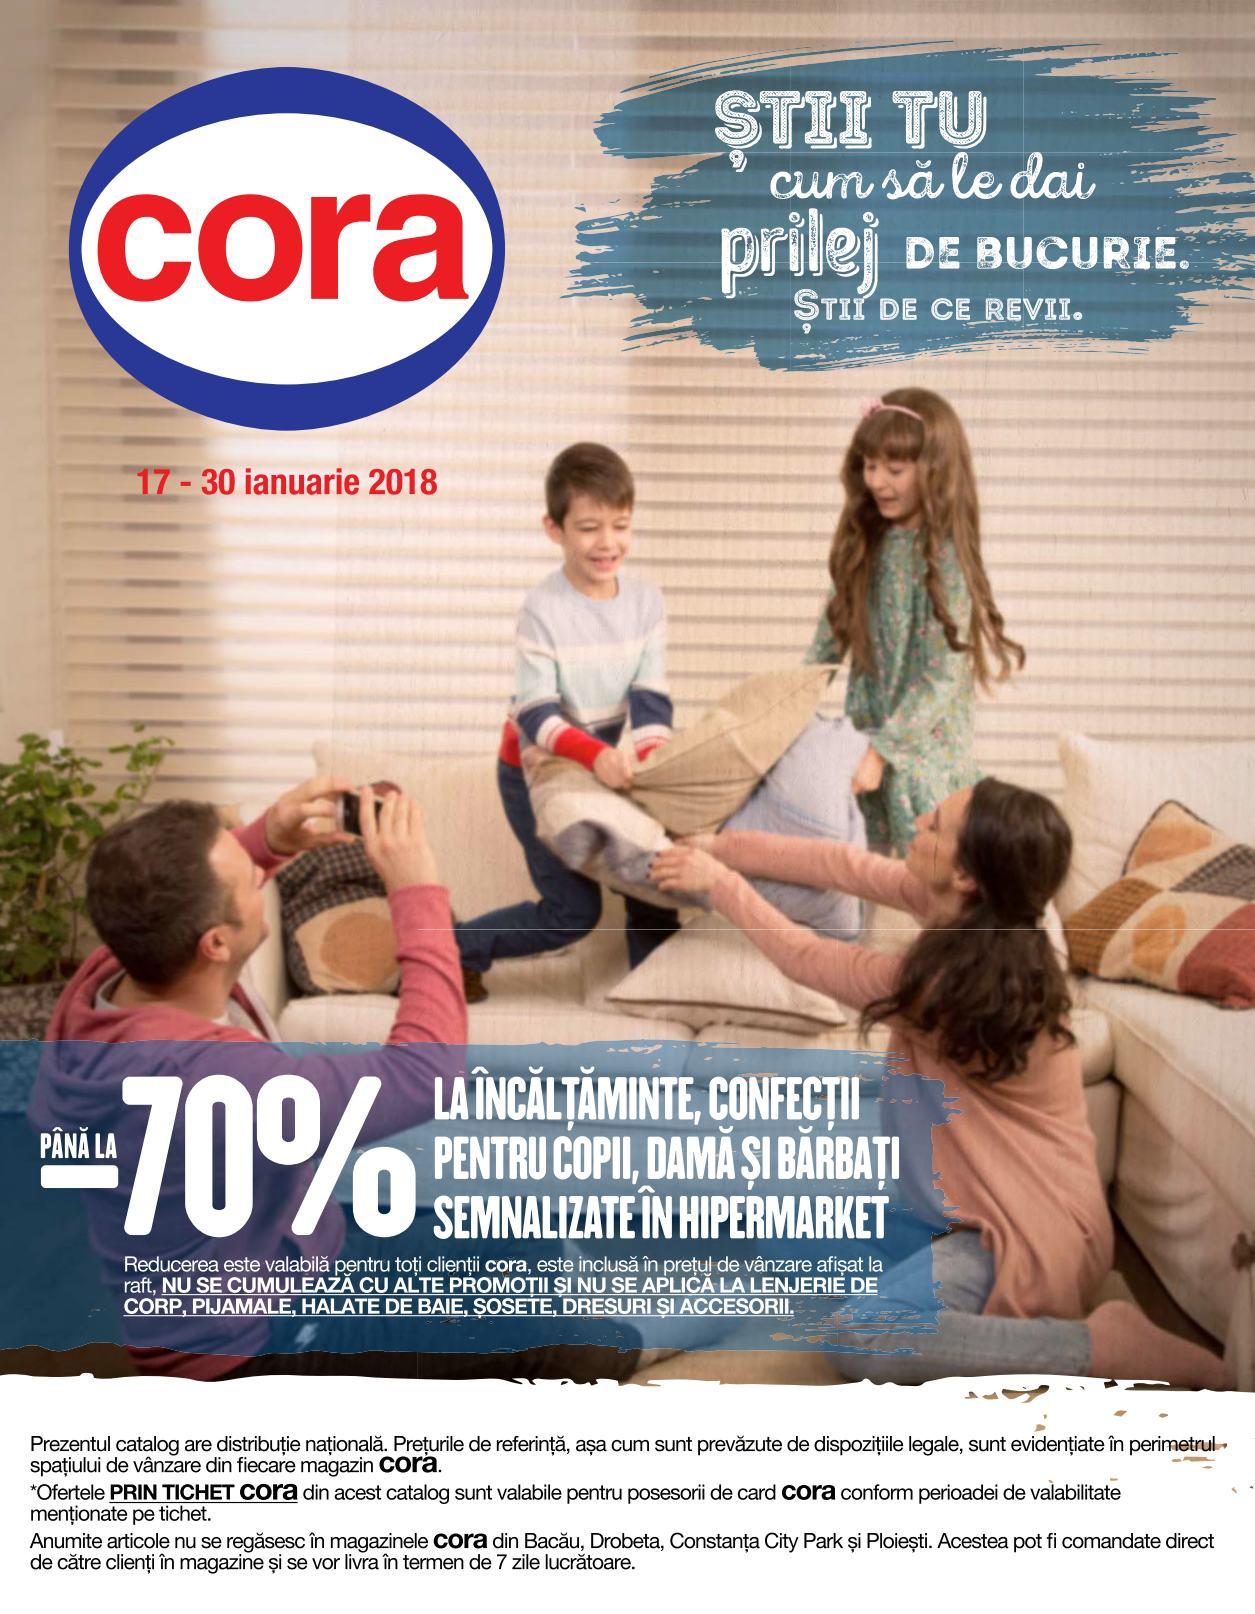 Catalog Cora oferte 17 ianuarie - 30 ianuarie 2018. Produse nealimentare